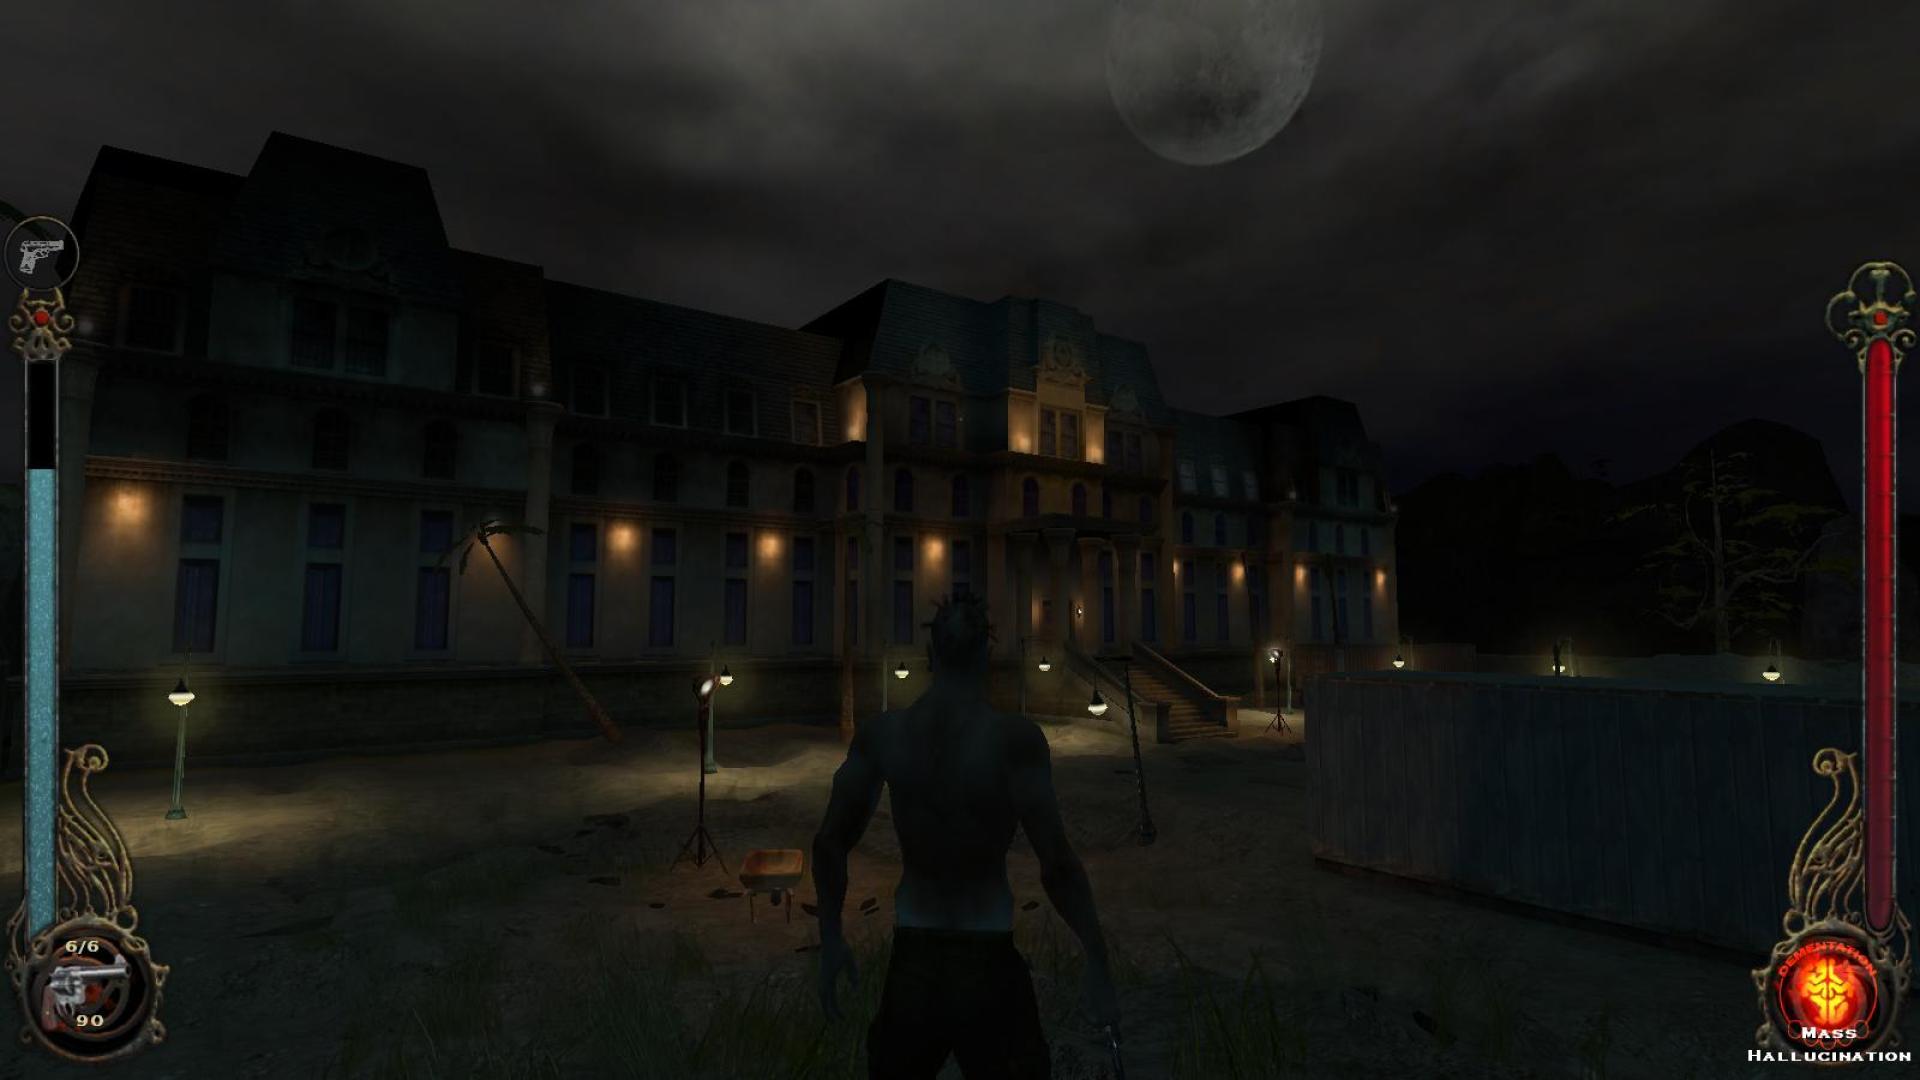 Vampire: The Masquerade - Bloodlines (2004) 4. kép